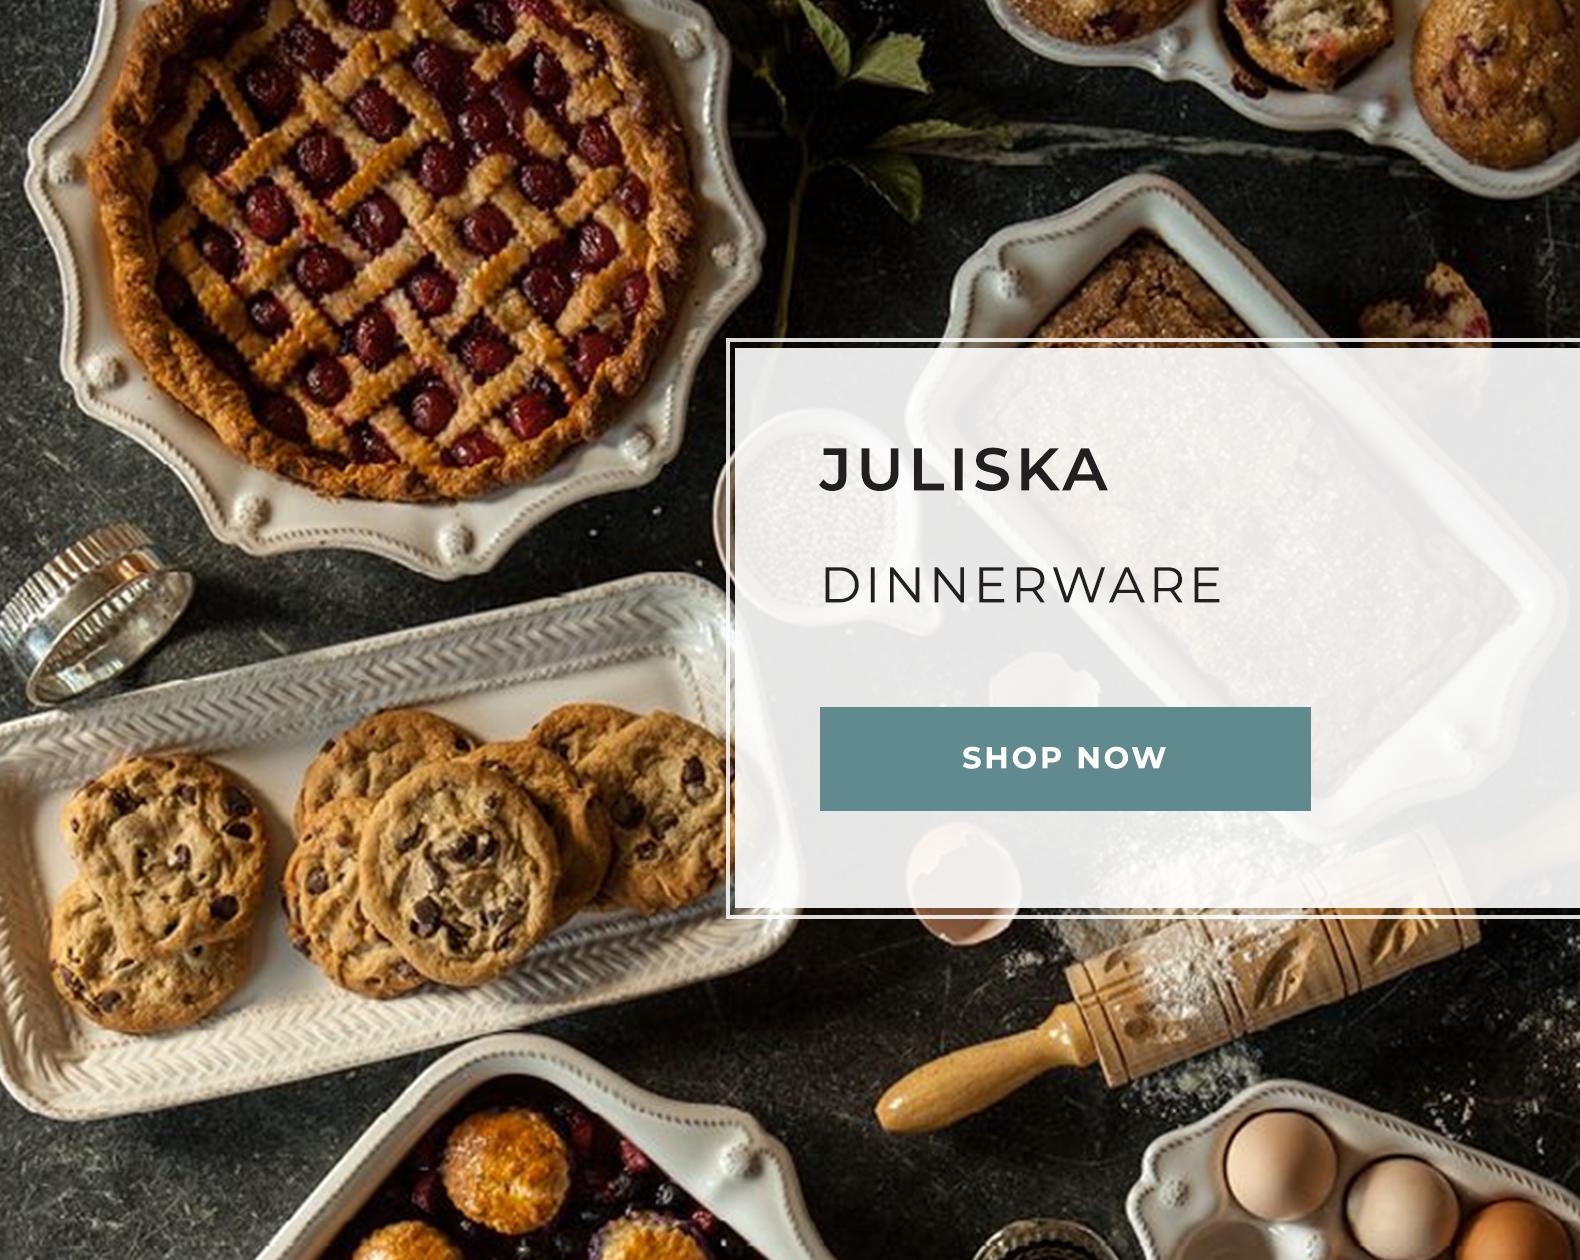 Juliska - Dinnerware